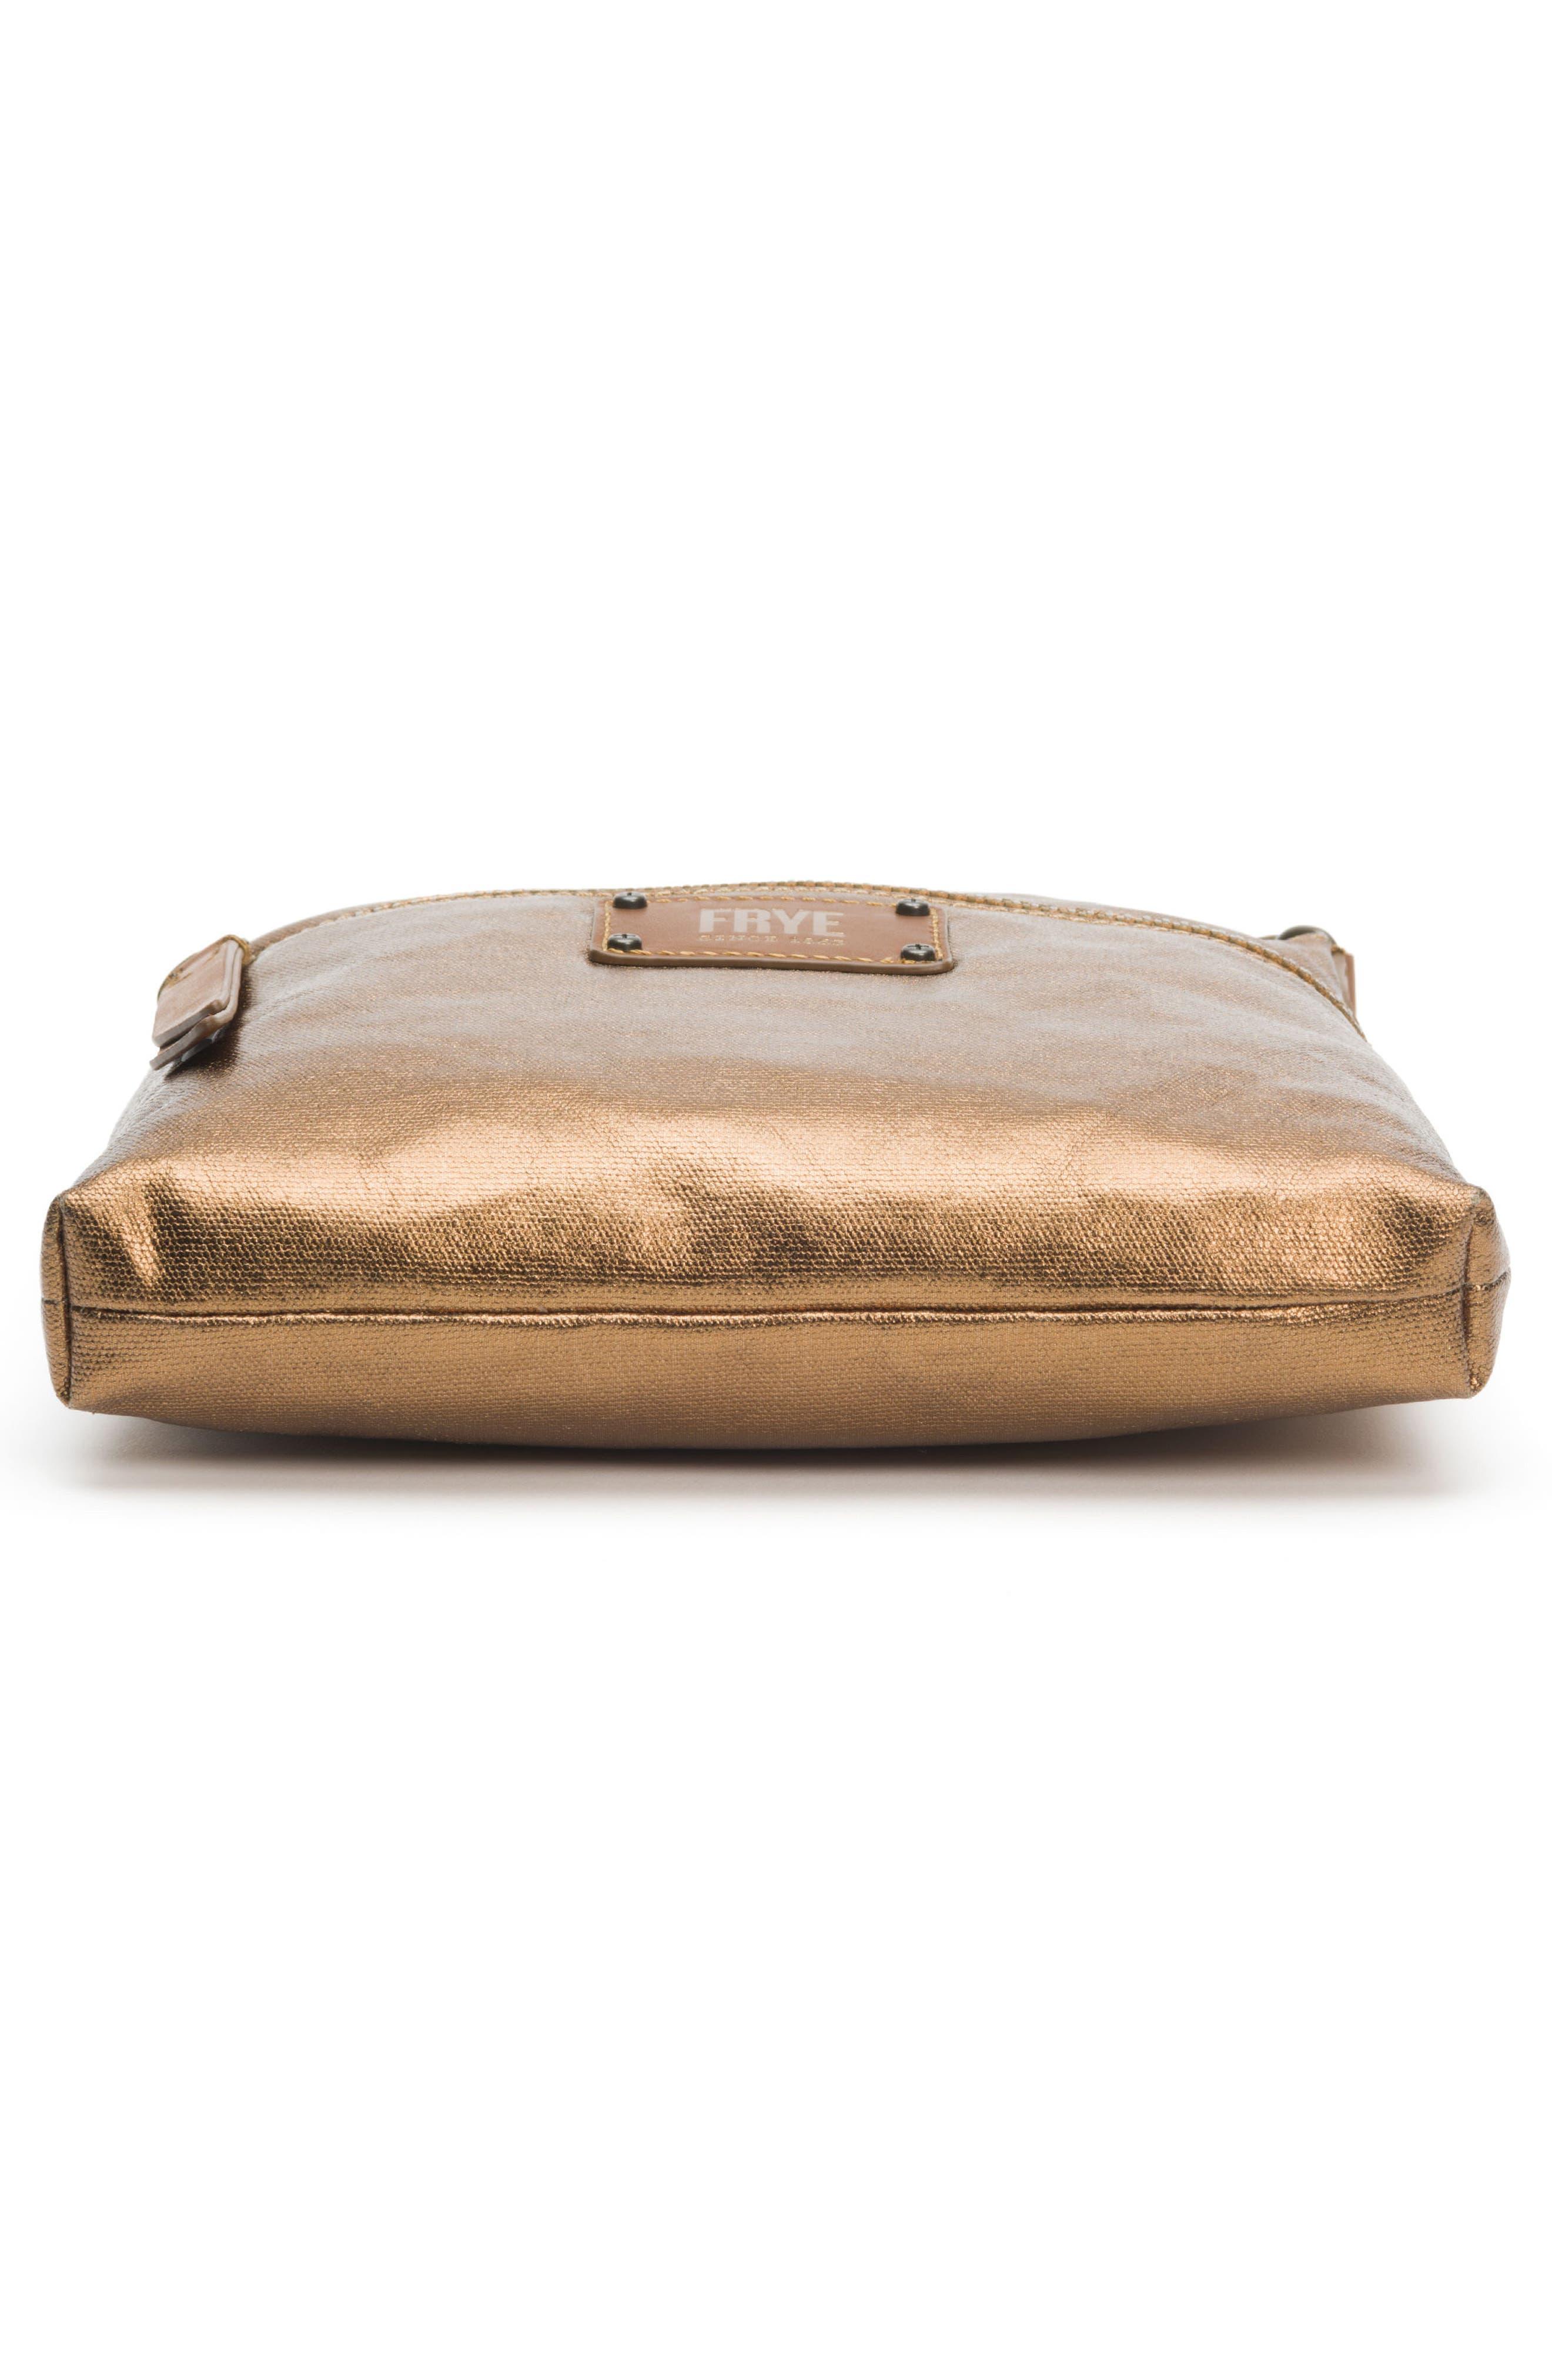 Ivy Metallic Nylon Crossbody Bag,                             Alternate thumbnail 6, color,                             Bronze